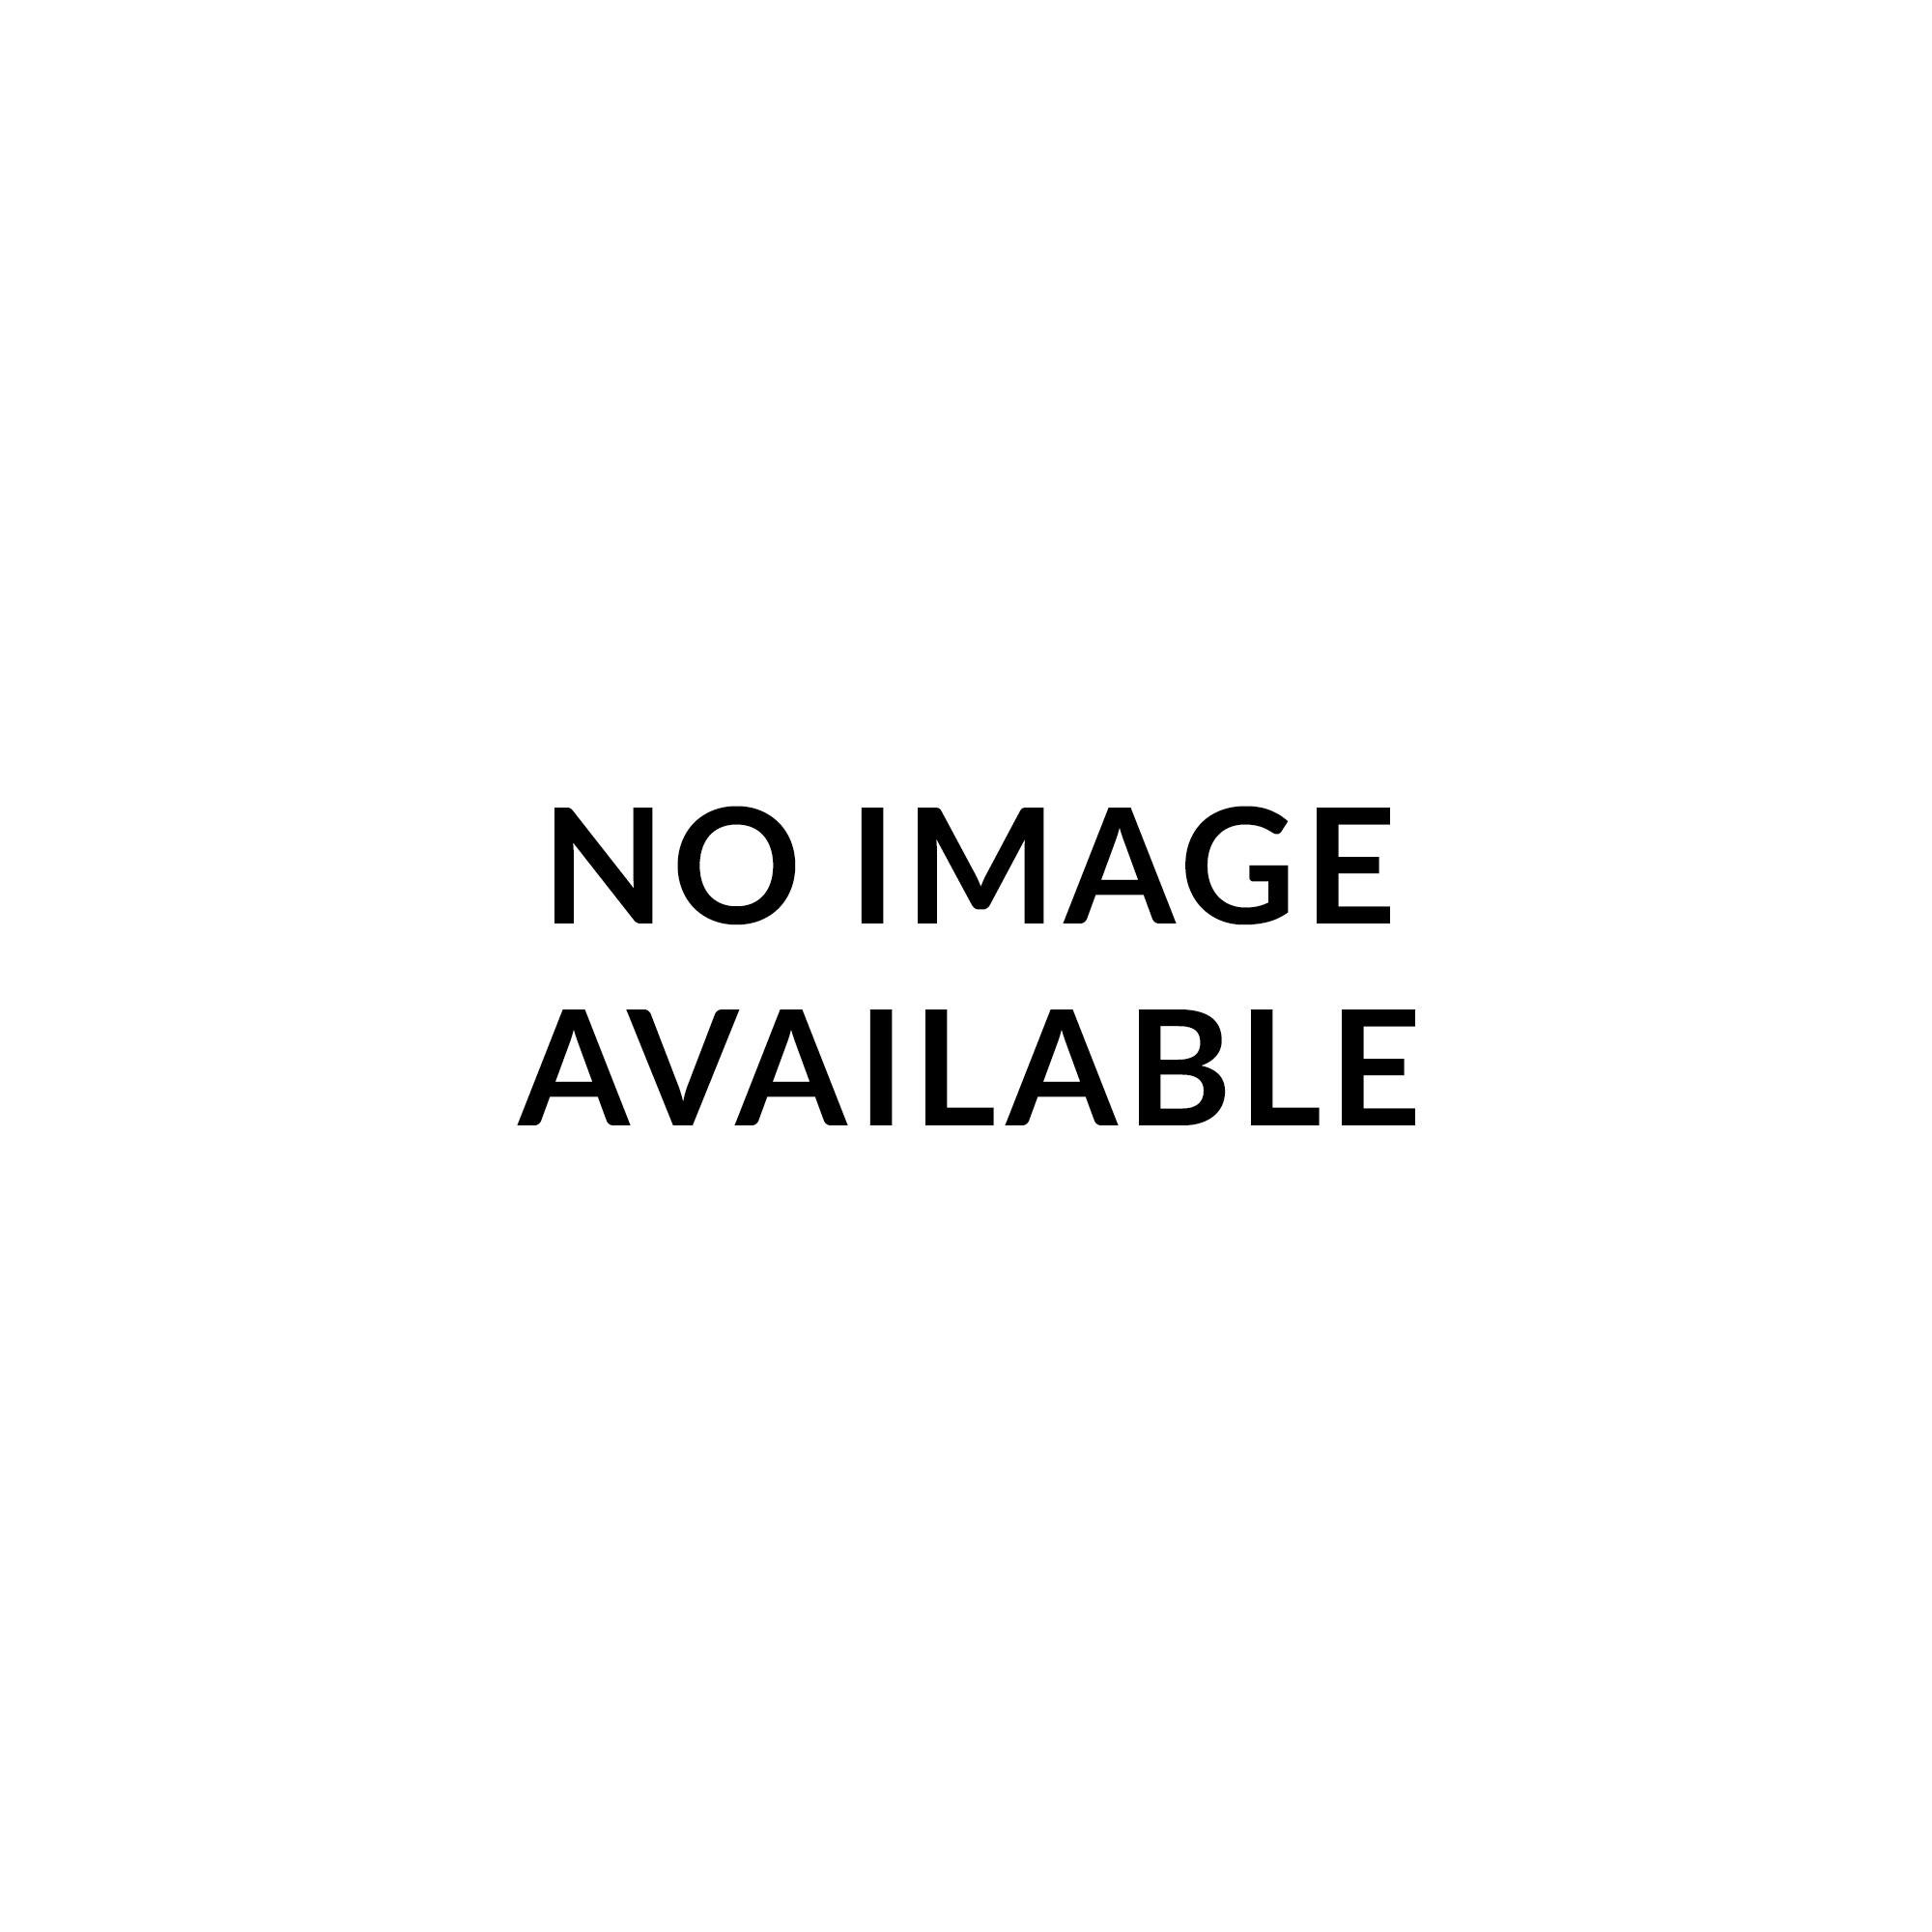 D'Addario PSB030 ProSteels XL Bass Single String .030 Long Scale